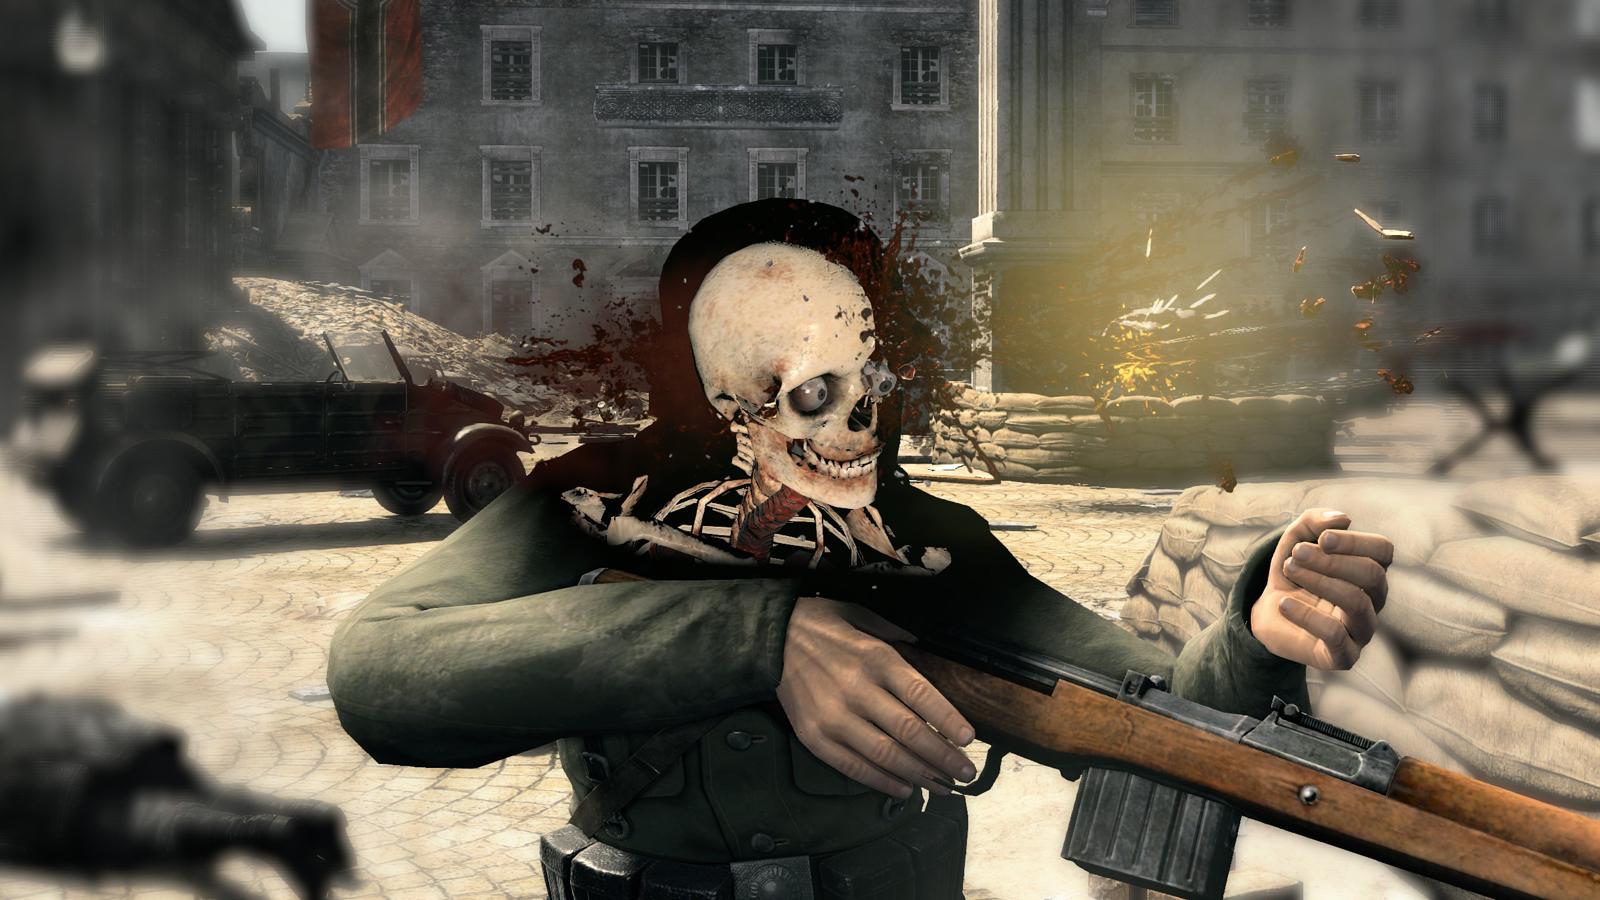 Clonare-jocuri-kill-cam-Sniper-Elite